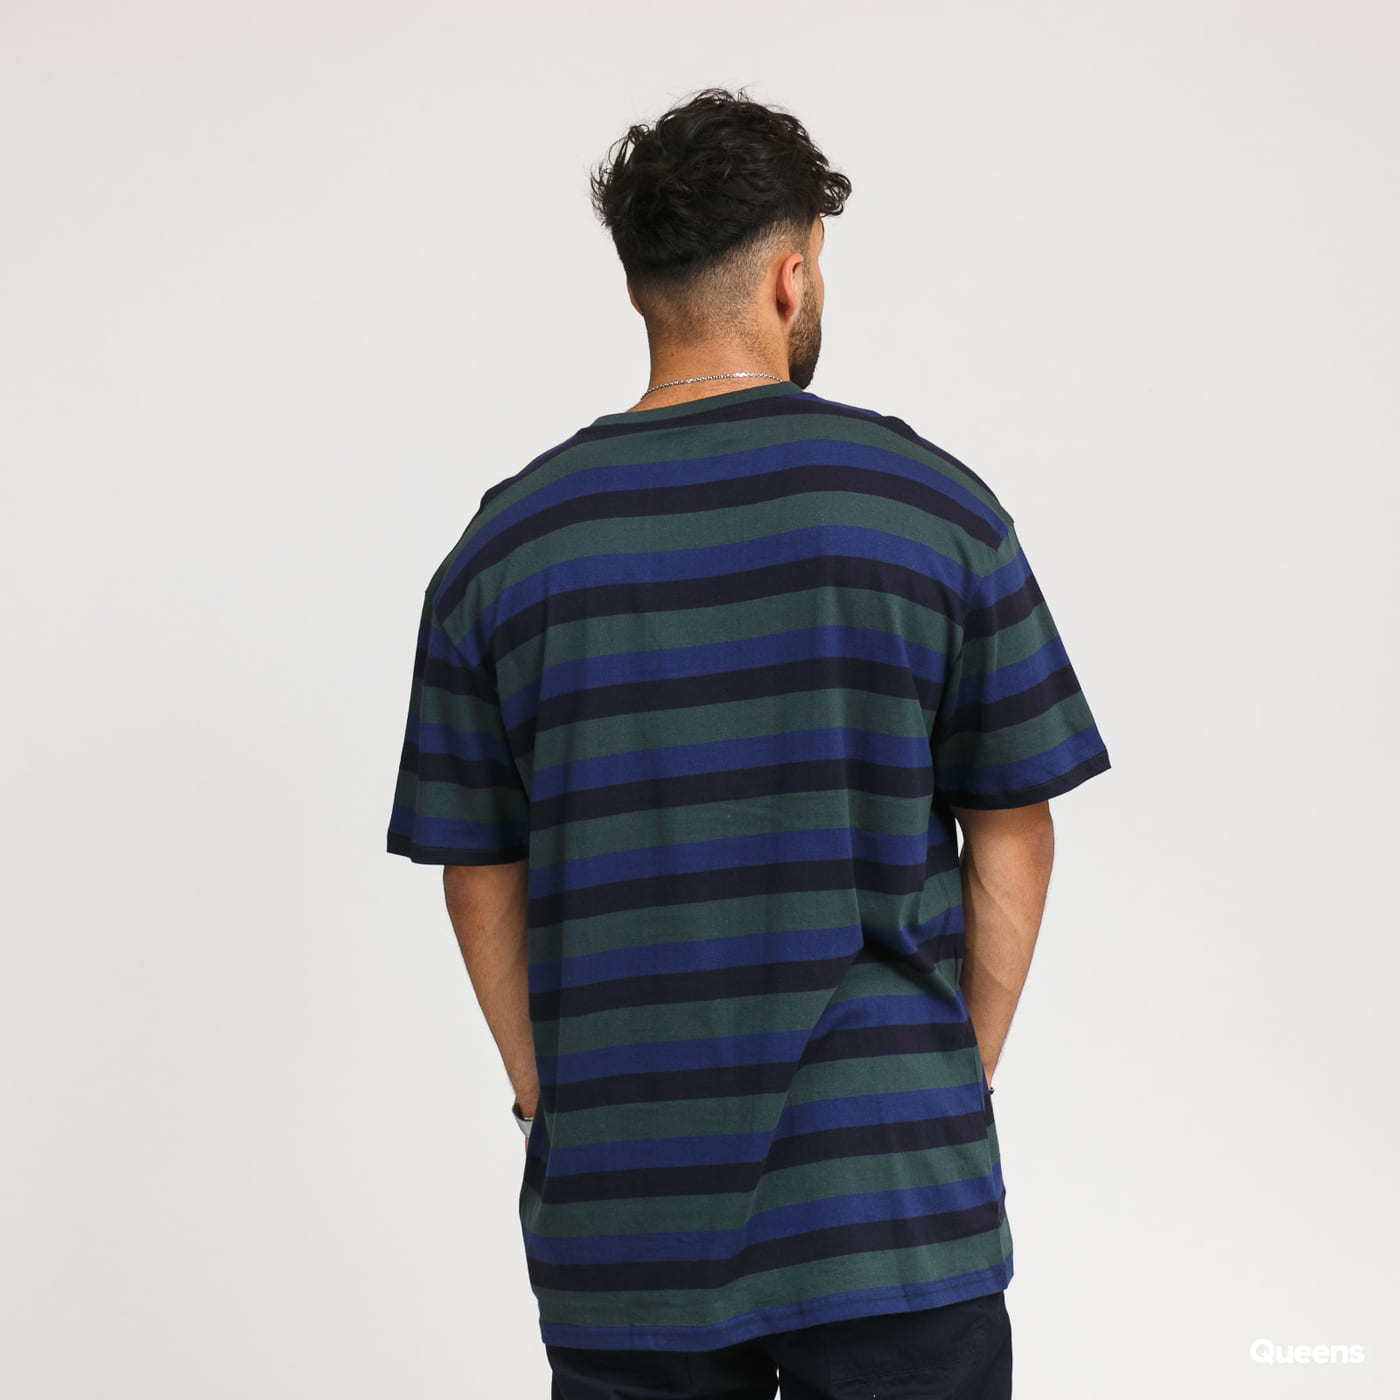 Urban Classics College Stripe Tee tmavě zelené / navy / tmavě modré